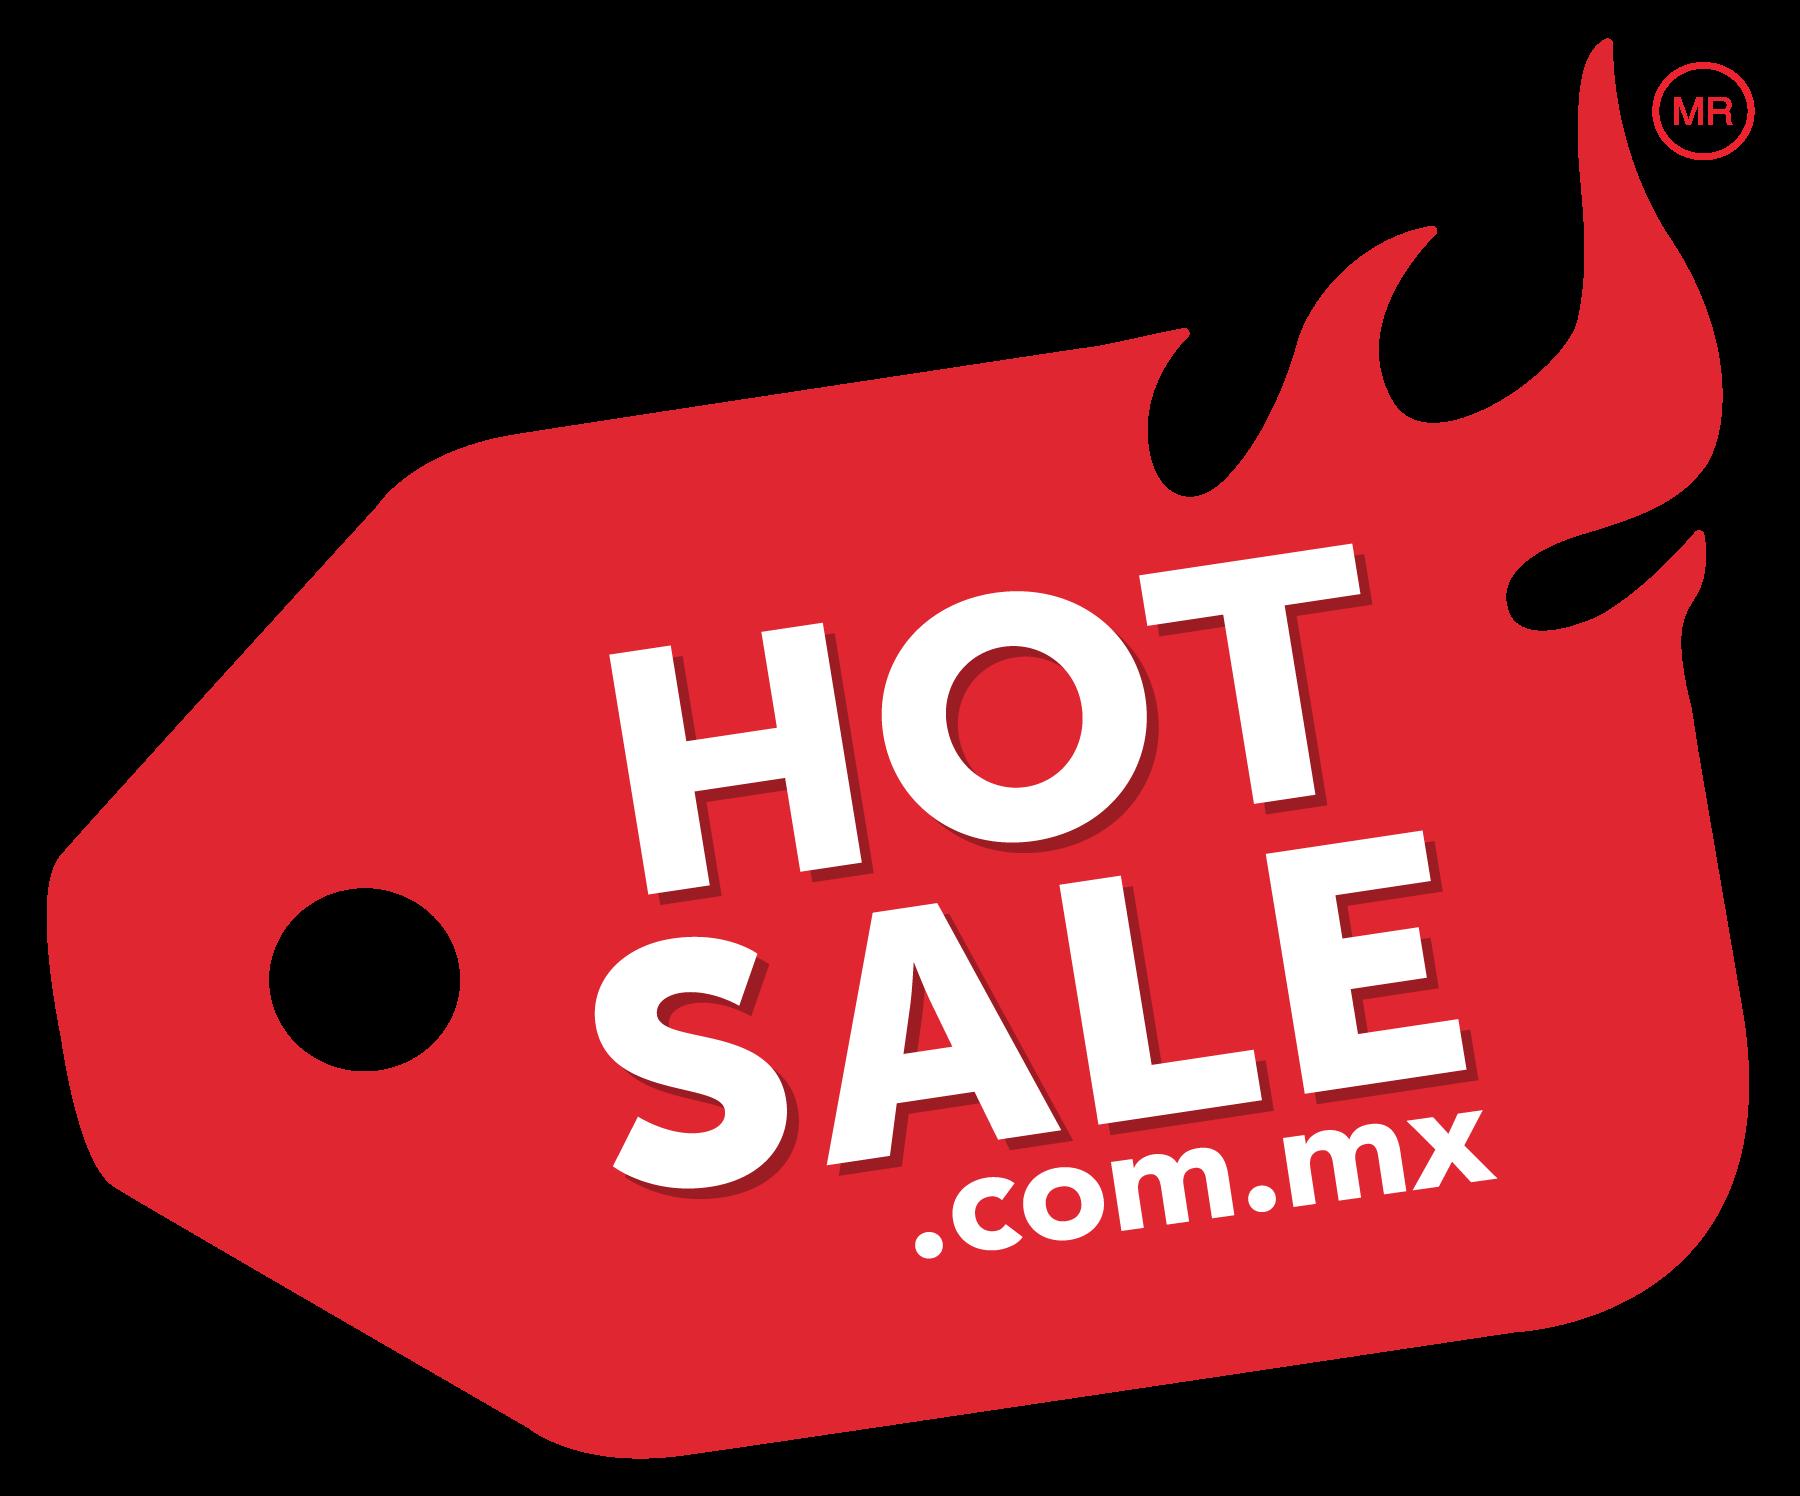 logotipo-HOTSALE-2021.png